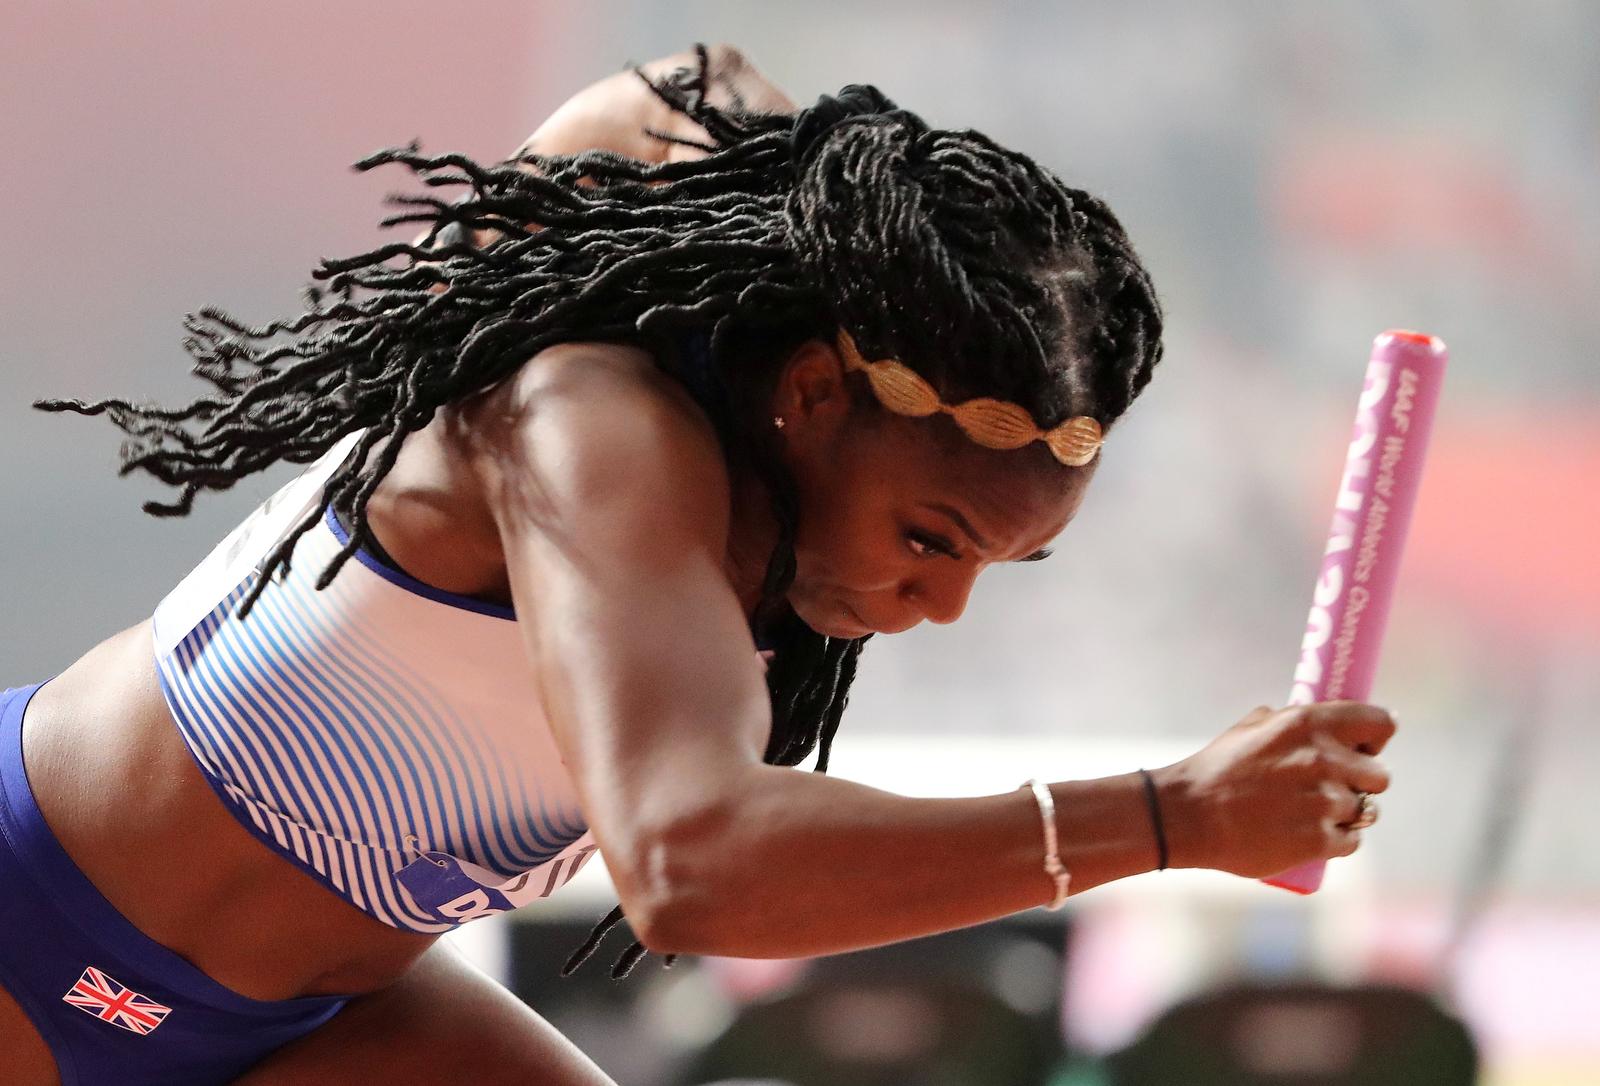 Athletics - World Athletics Championships - Doha 2019 - Women's 4x100 Metres Relay Heats - Khalifa International Stadium, Doha, Qatar - October 4, 2019   Britain's Asha Philip in action REUTERS